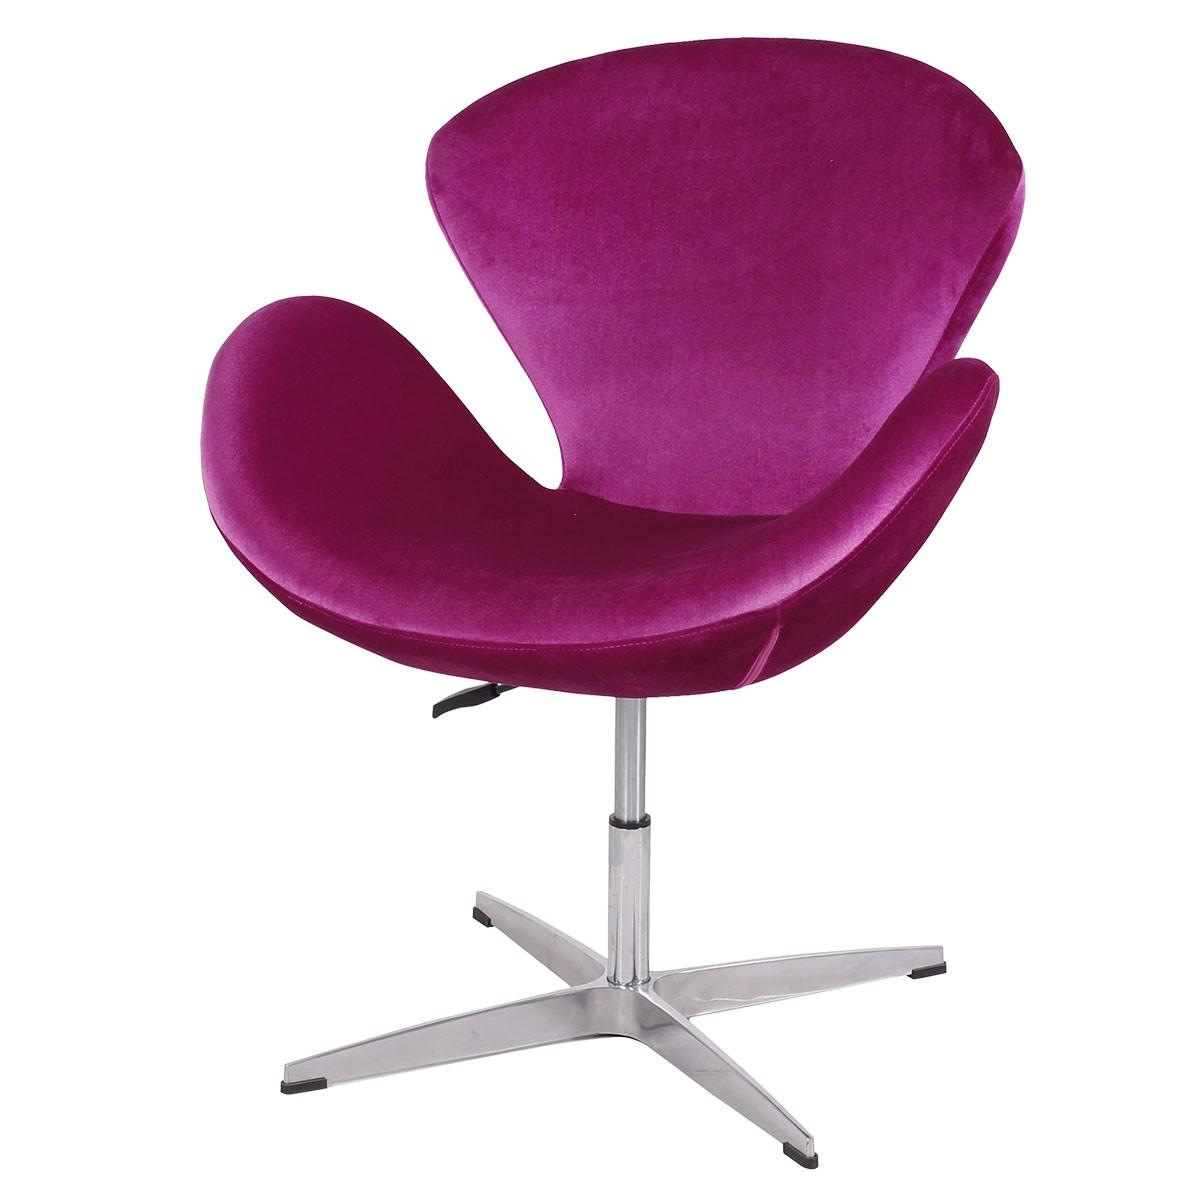 Silla auxiliar 209 muebles arteco for Sillas para salas pequenas